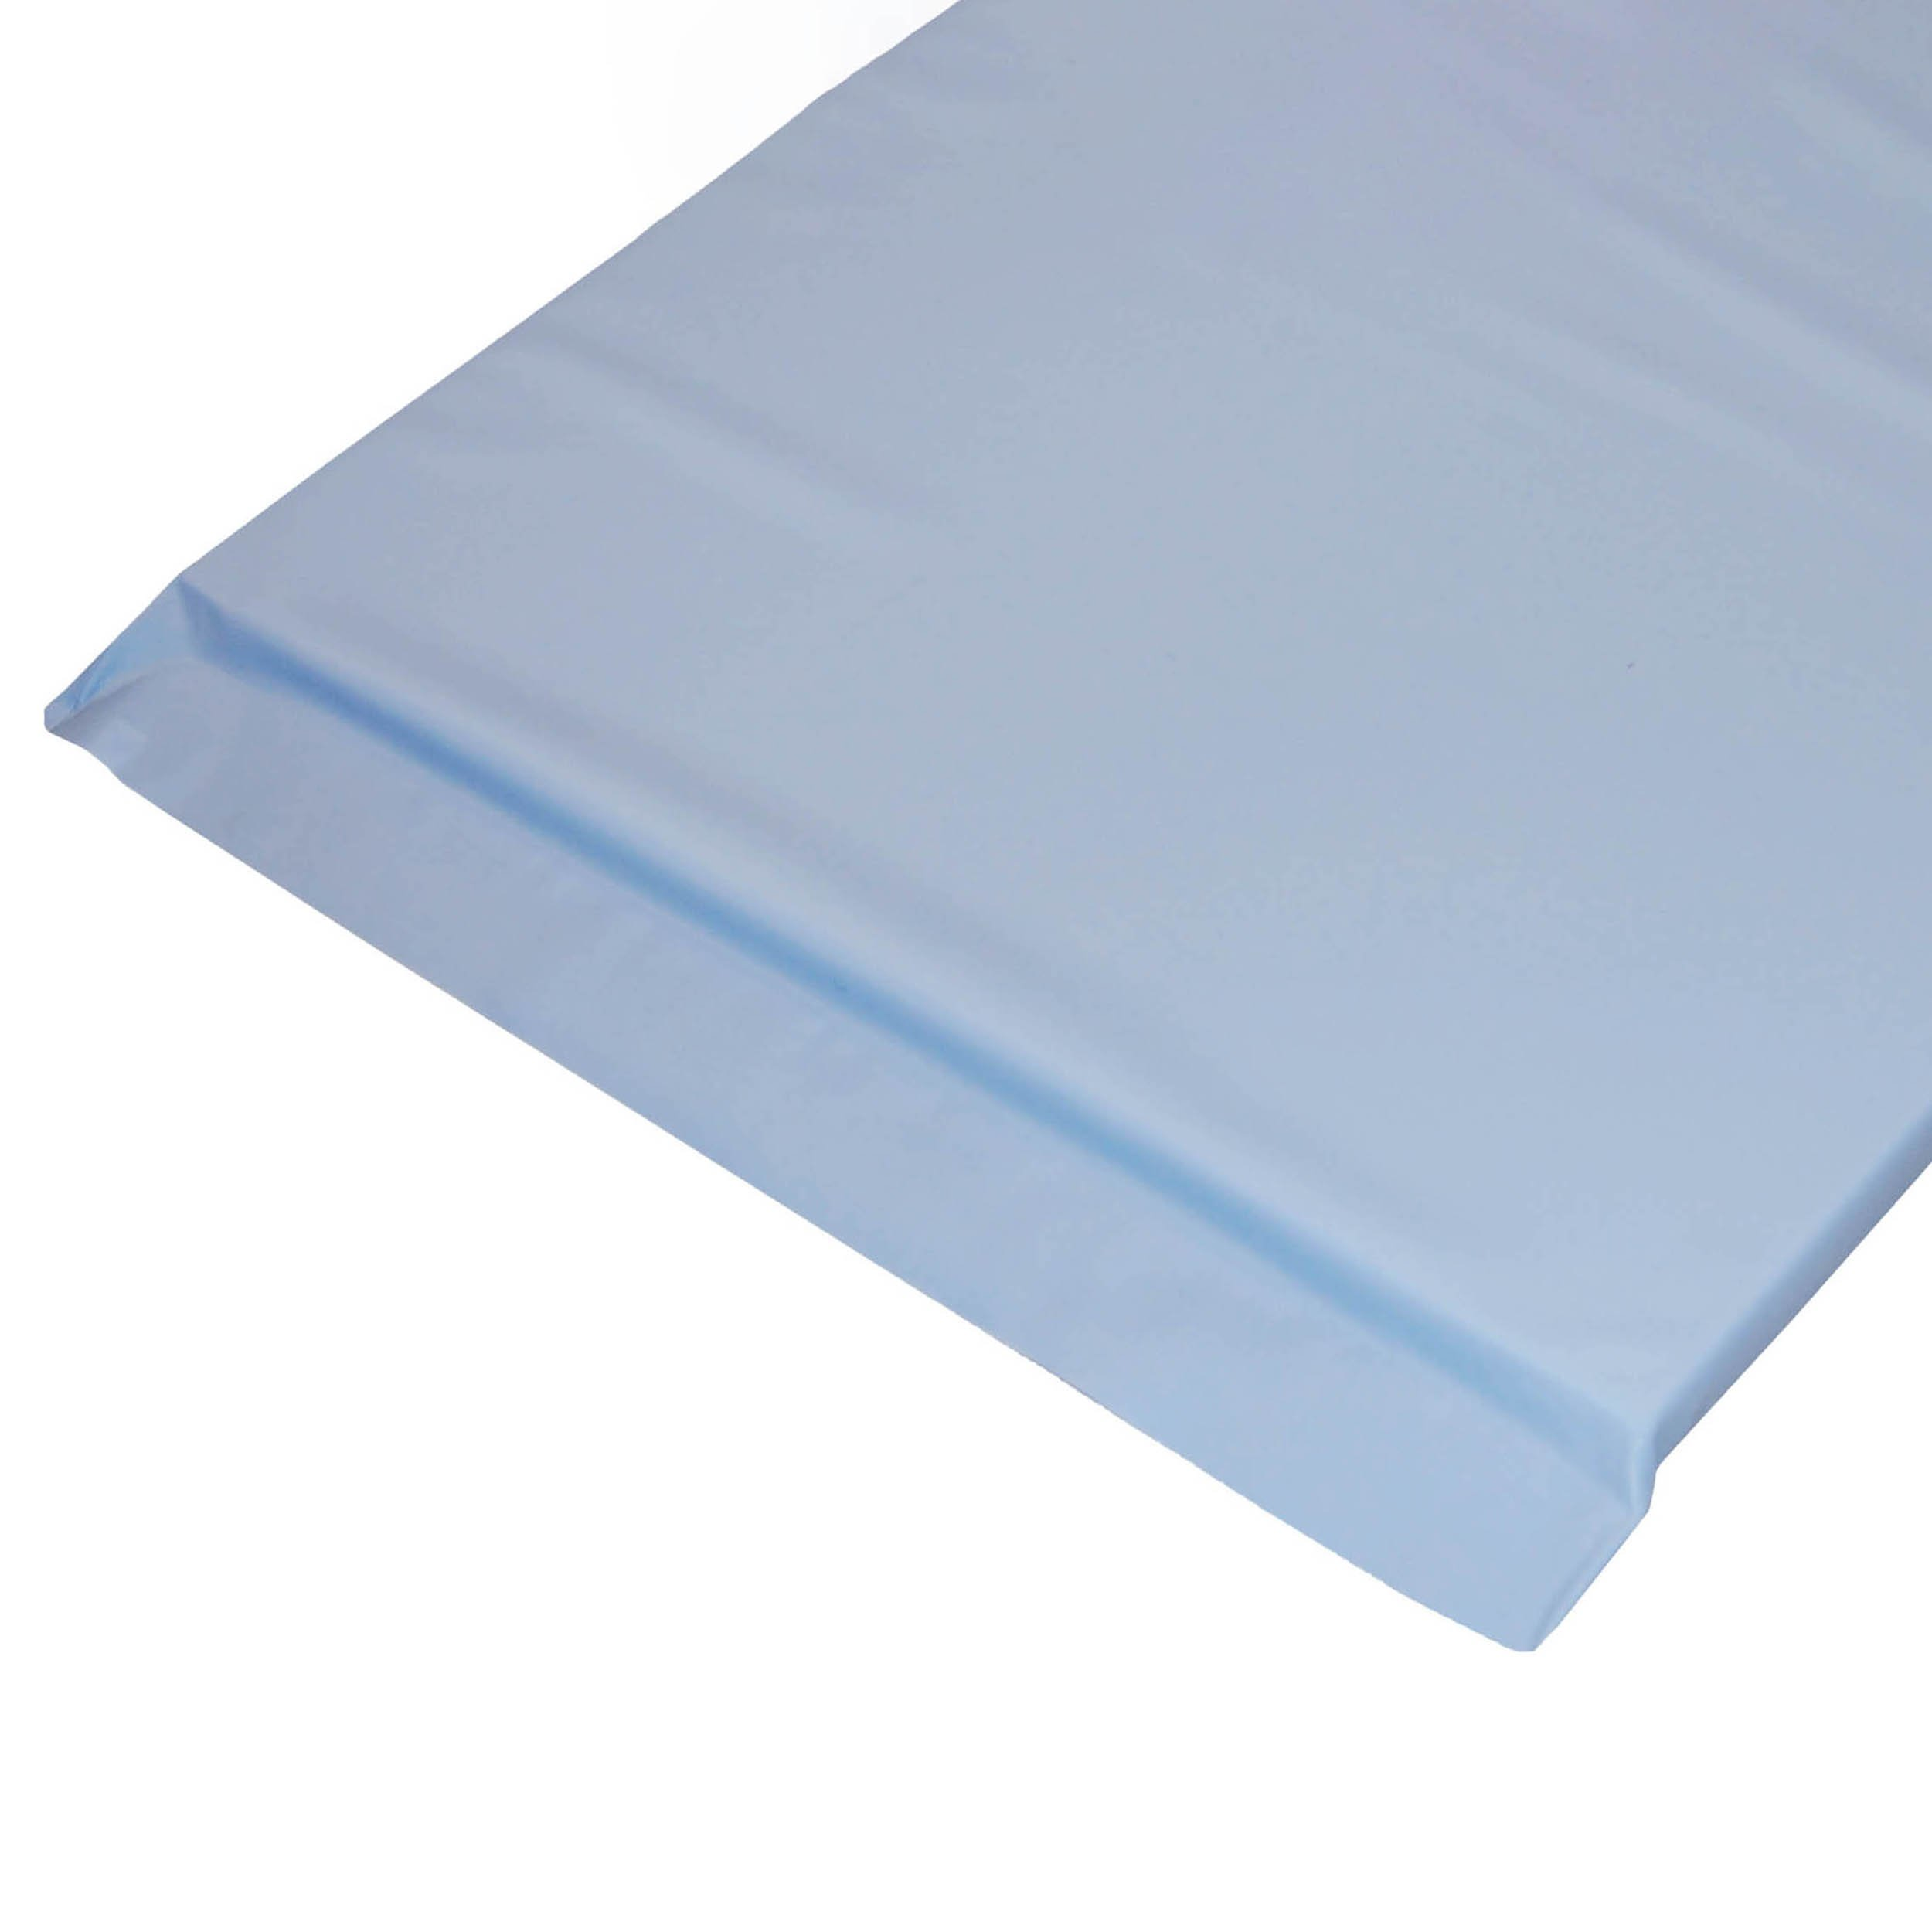 Economy Standard Radiolucent X-Ray Firm Foam Table Pad - Light Blue Vinyl, No Grommets 72